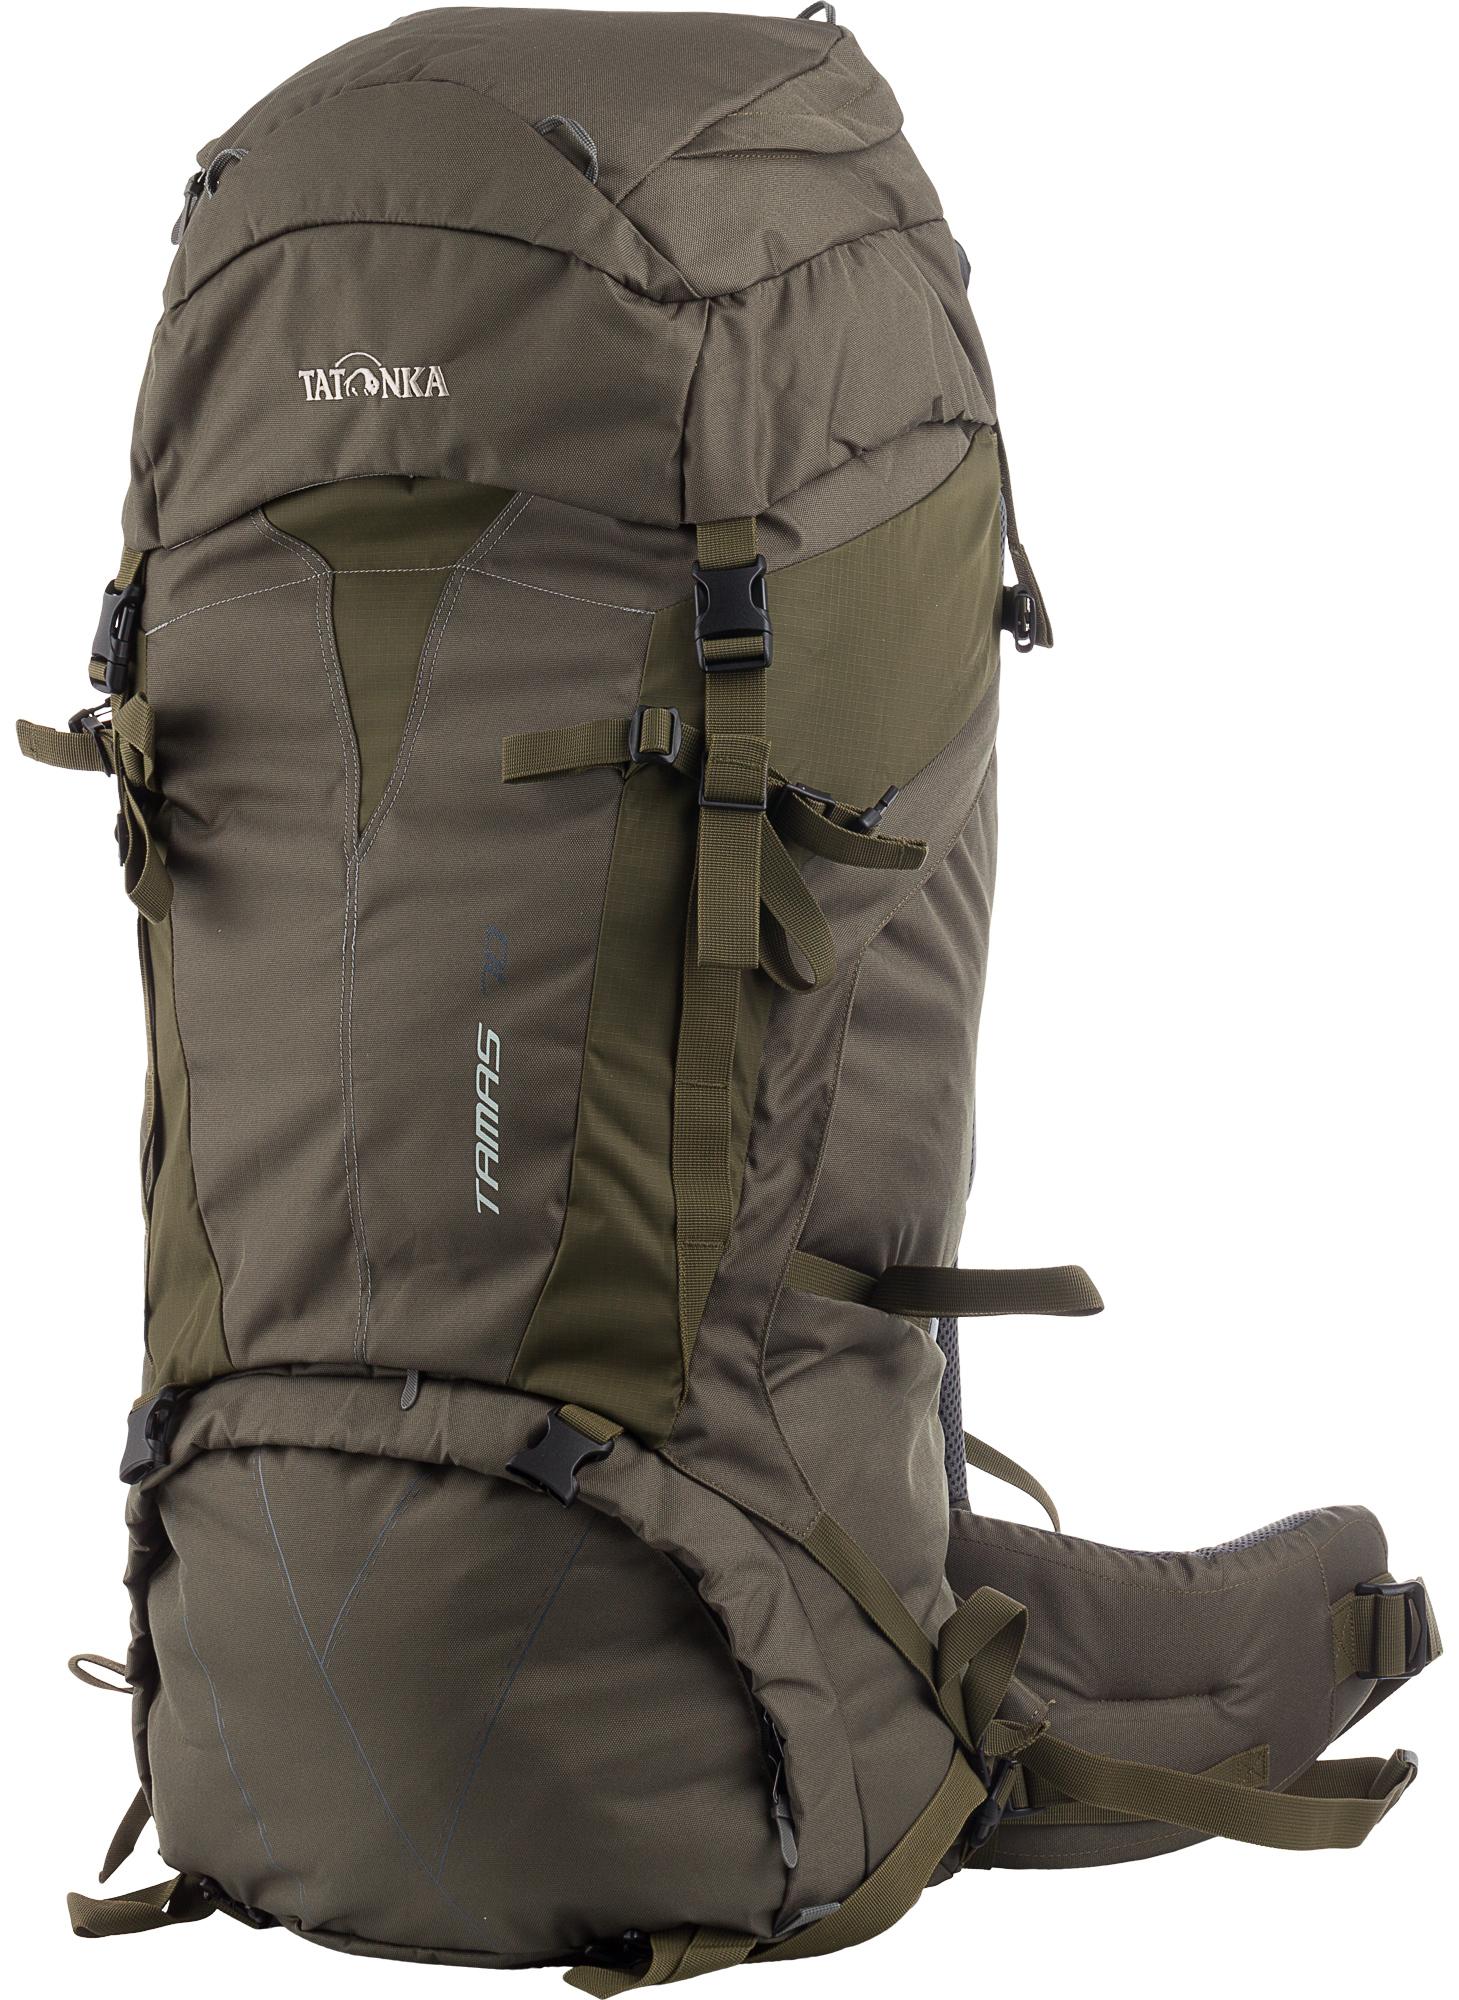 Tatonka Tatonka Tamas 70, размер Без размера детский рюкзак tatonka mowgli цвет серый 1806 043